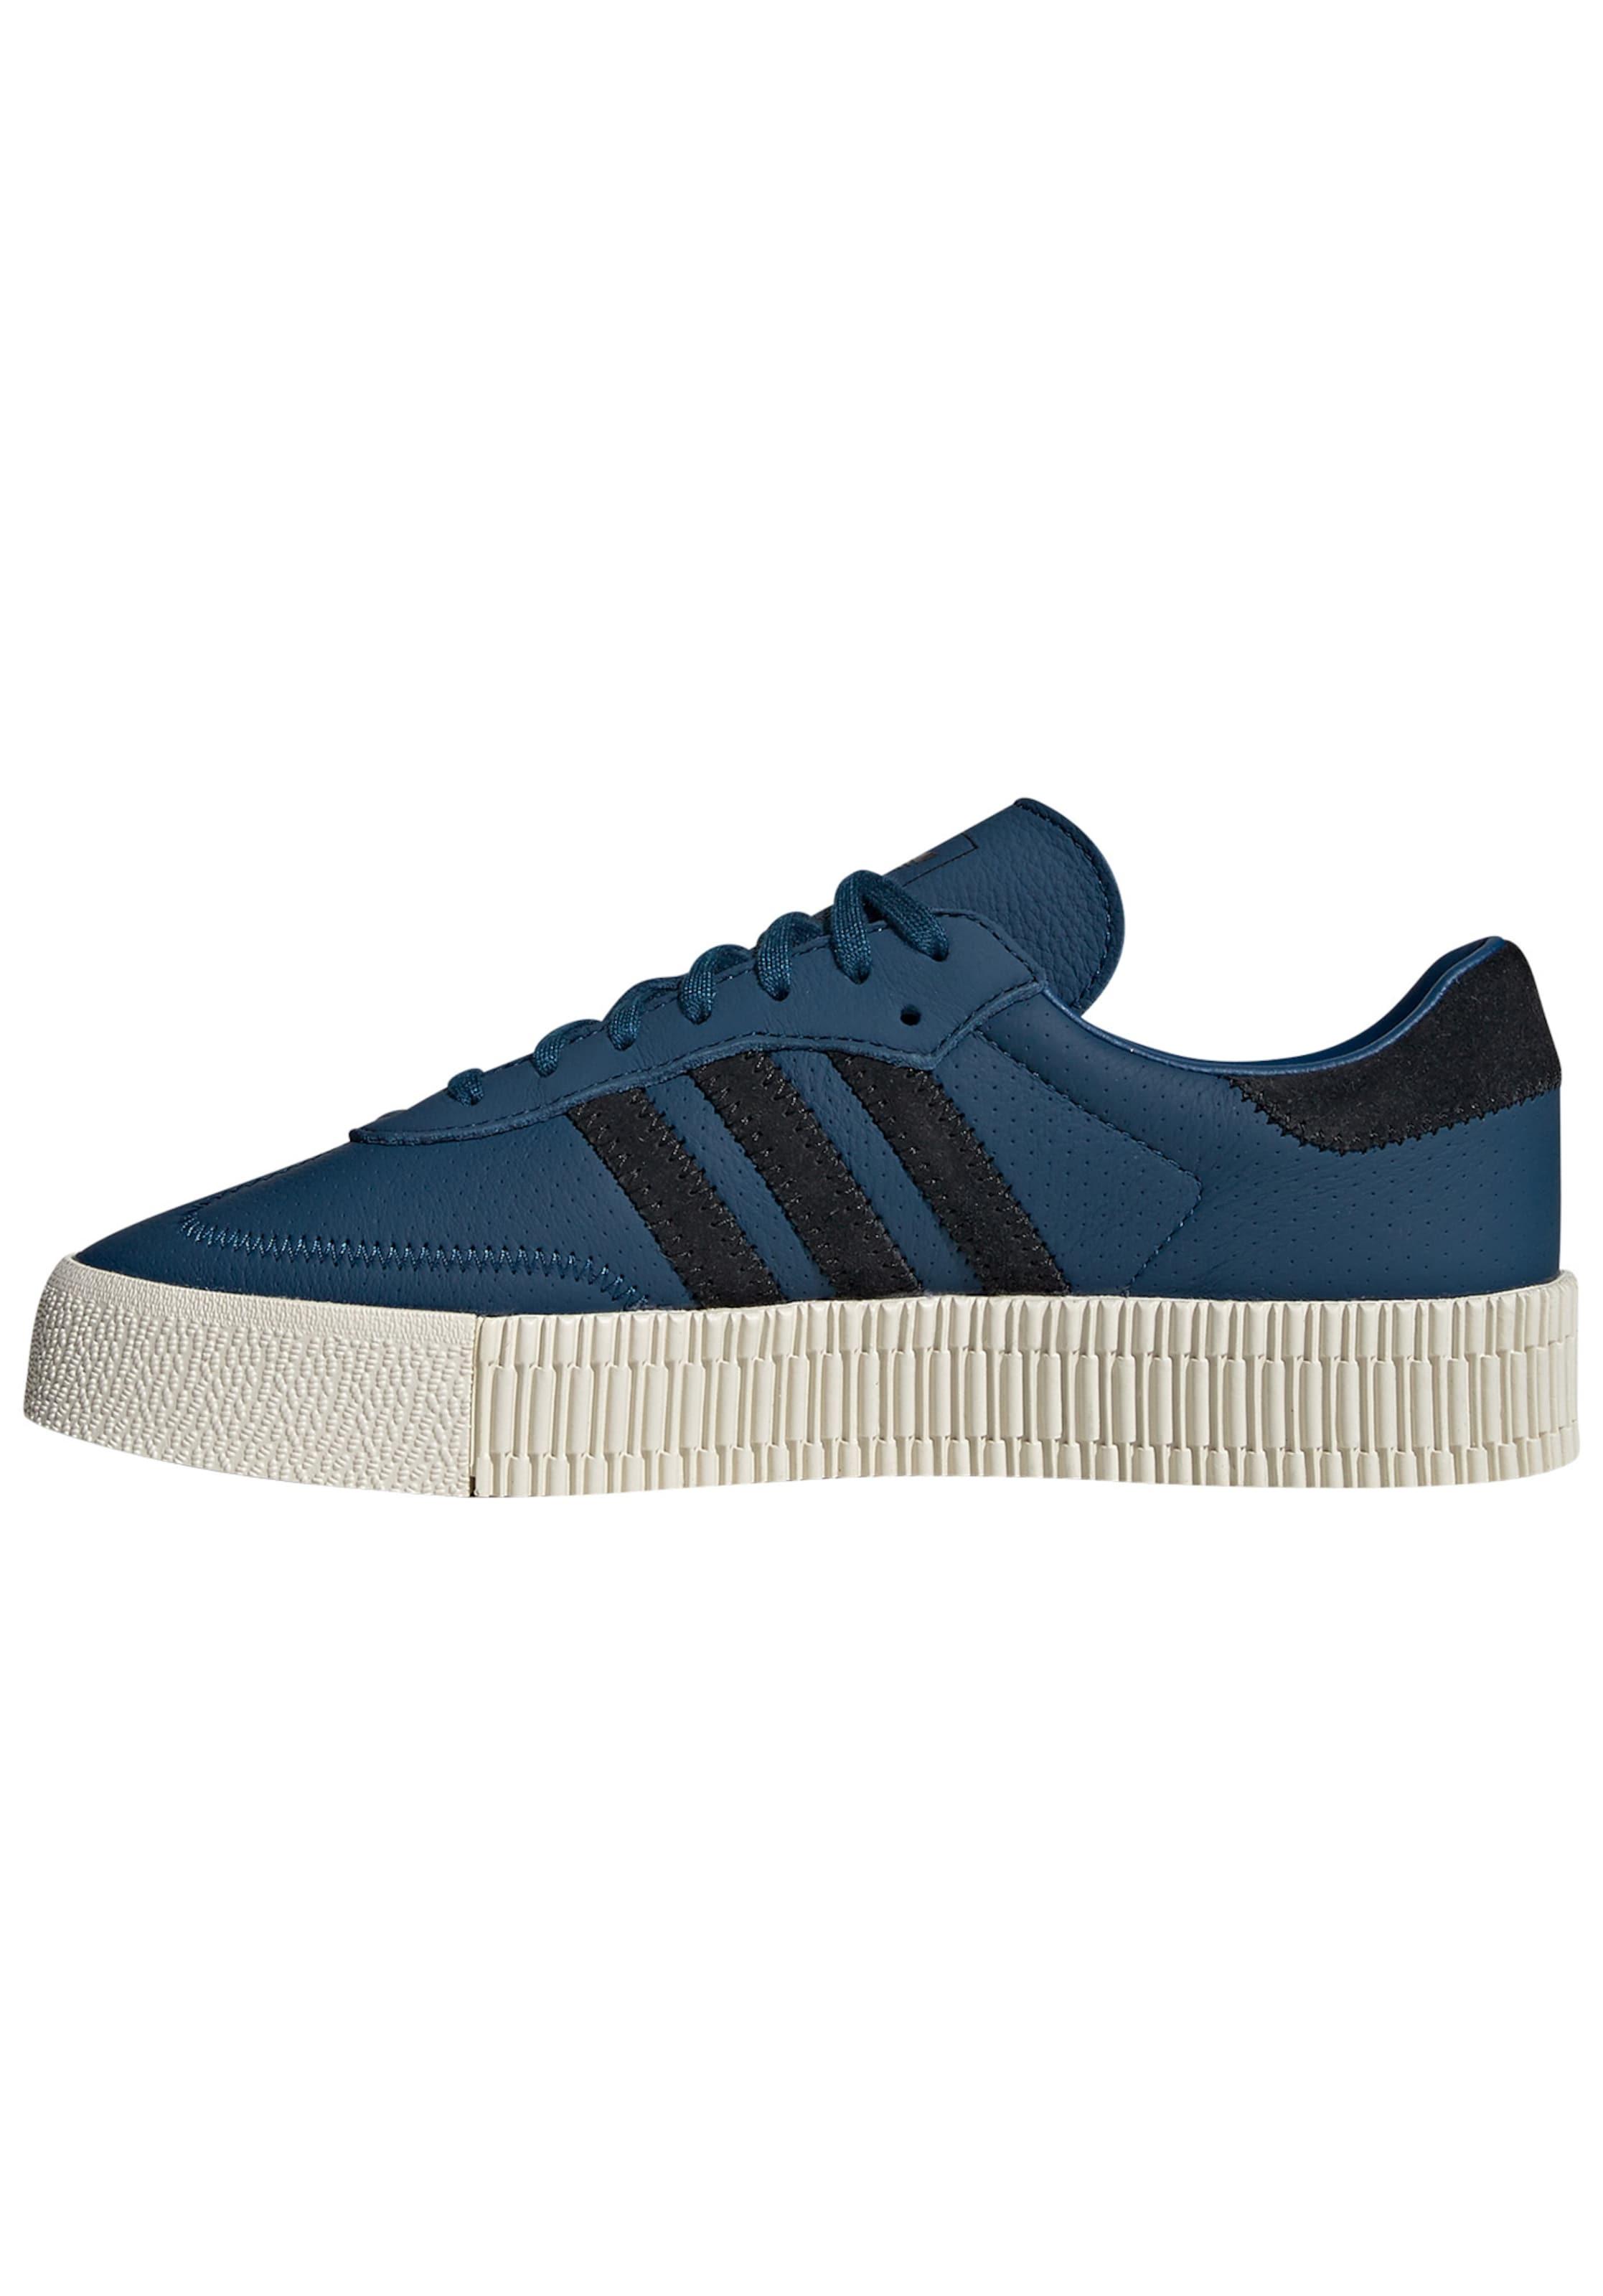 Sneaker In BlauSchwarz Adidas Originals 'sambarose' f6yv7gYmIb